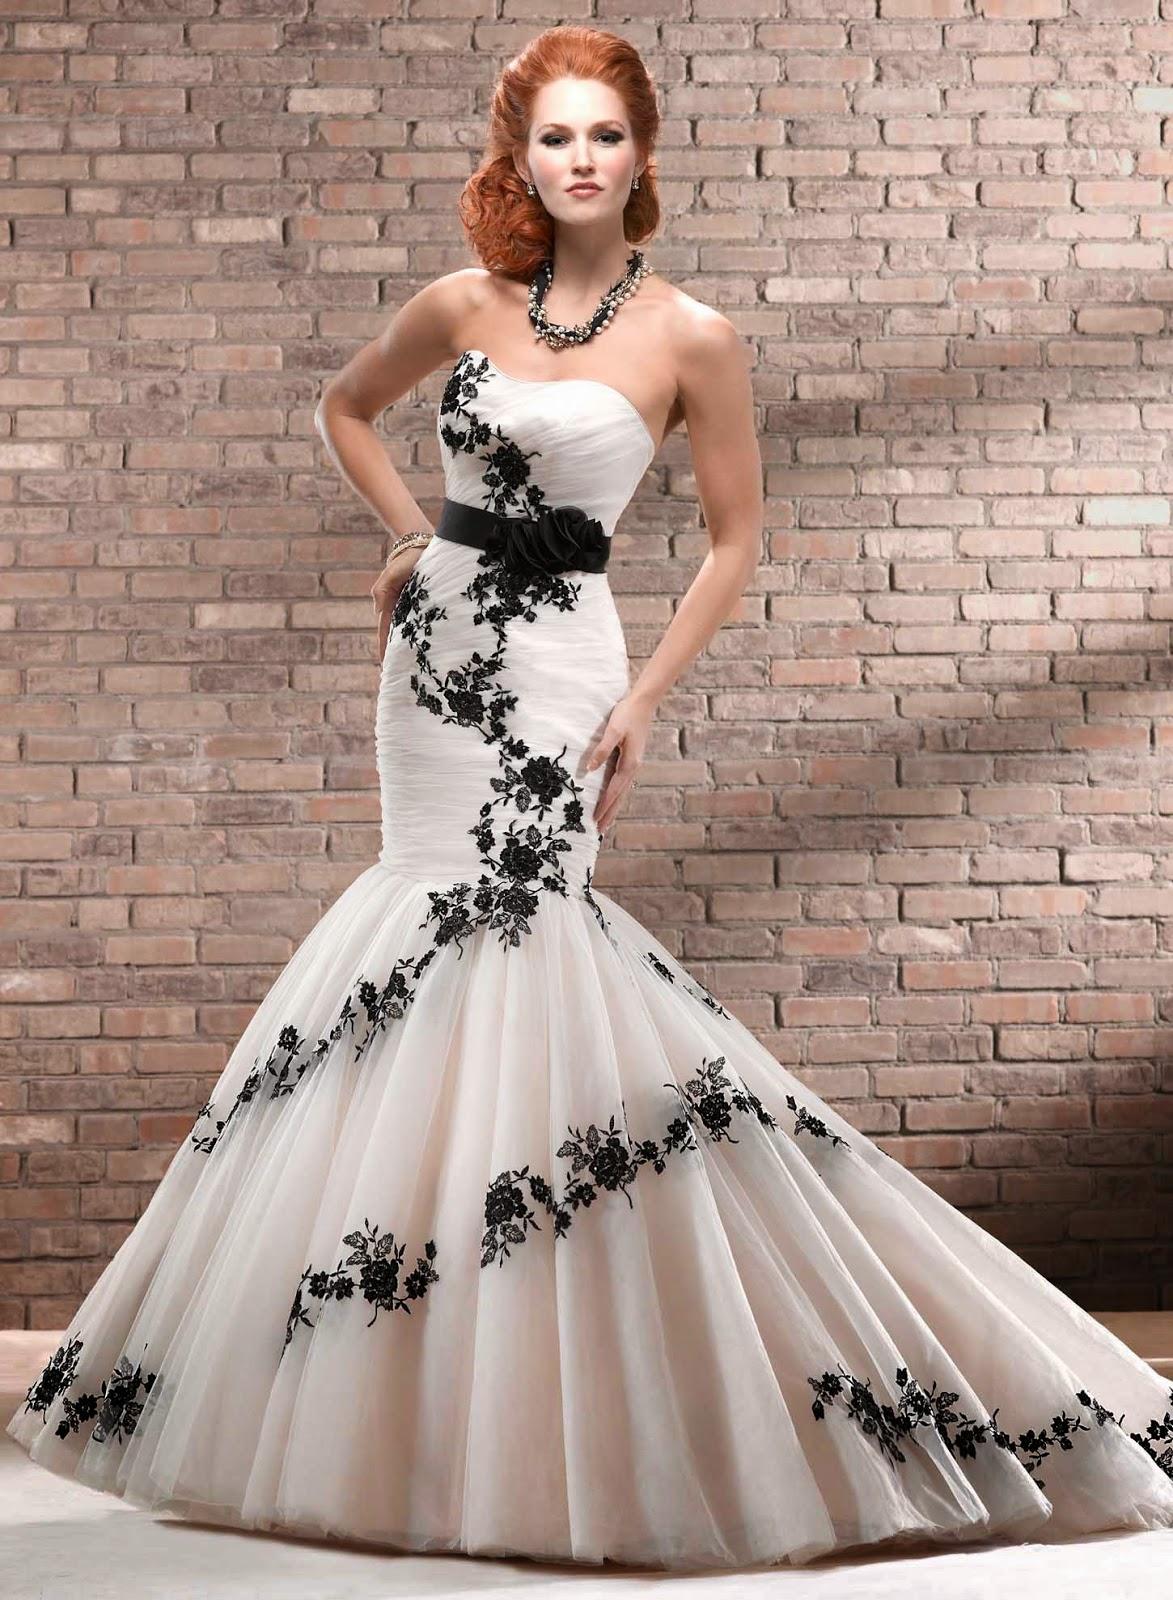 Vestidos de Novia con Flores Negras, parte 3